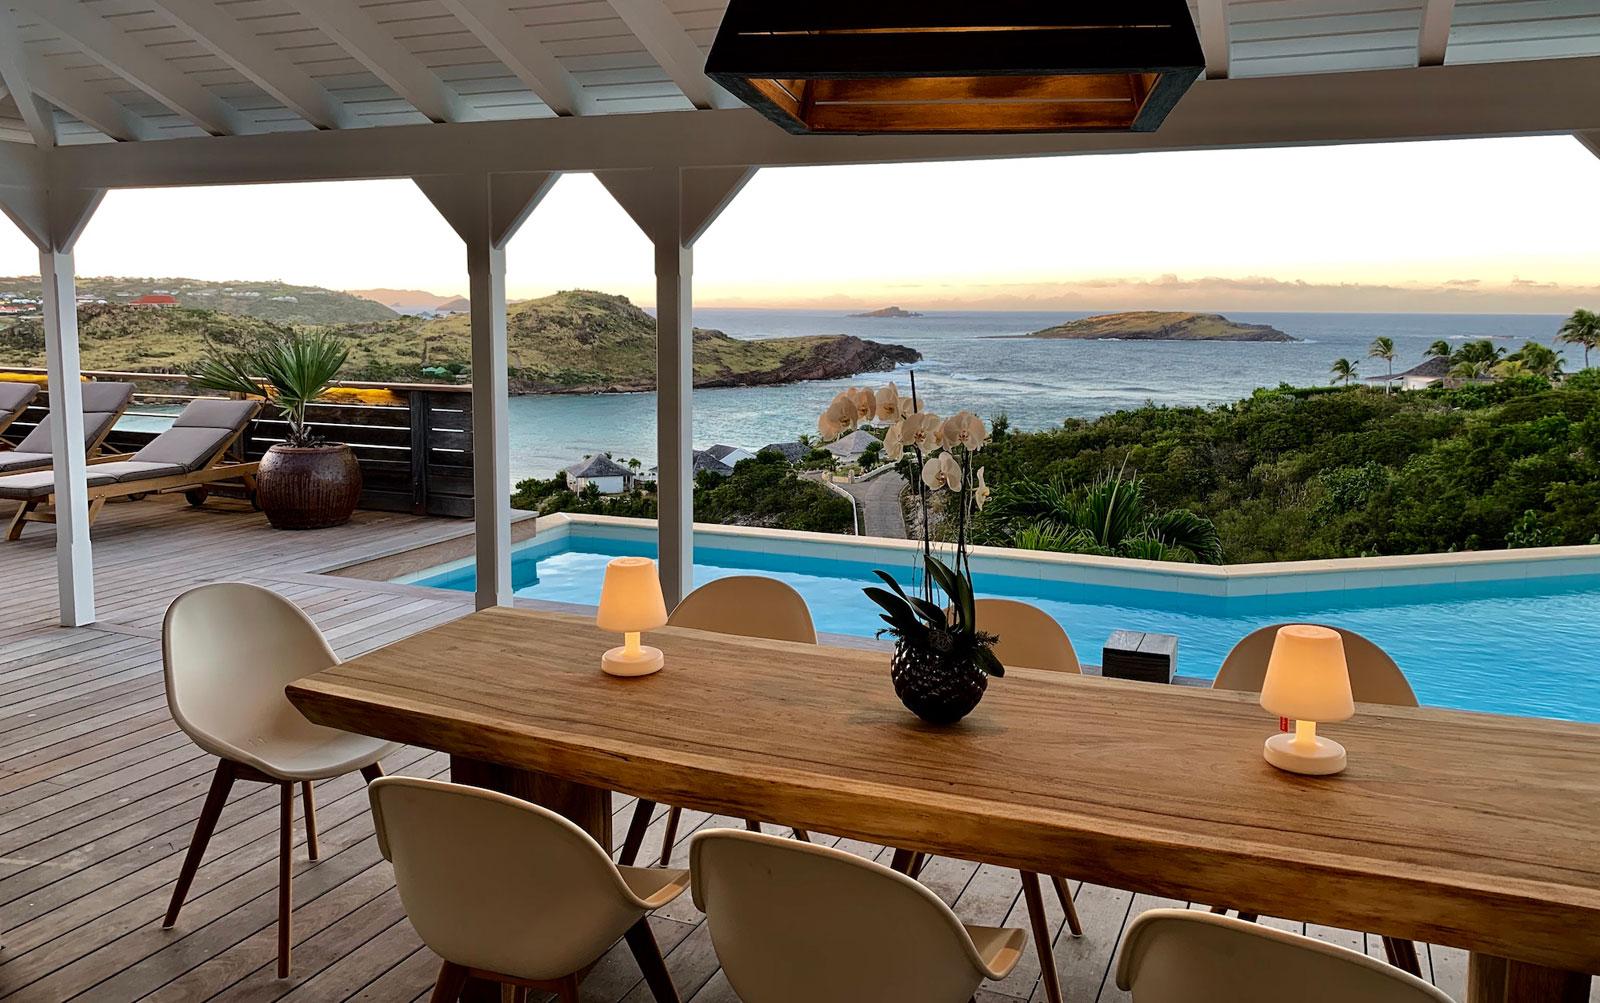 Villa Lagon Rose - Spacious Villa Rental St Barth Petit Cul De Sac with Beautiful Sea View - Patio and Swimming Pool